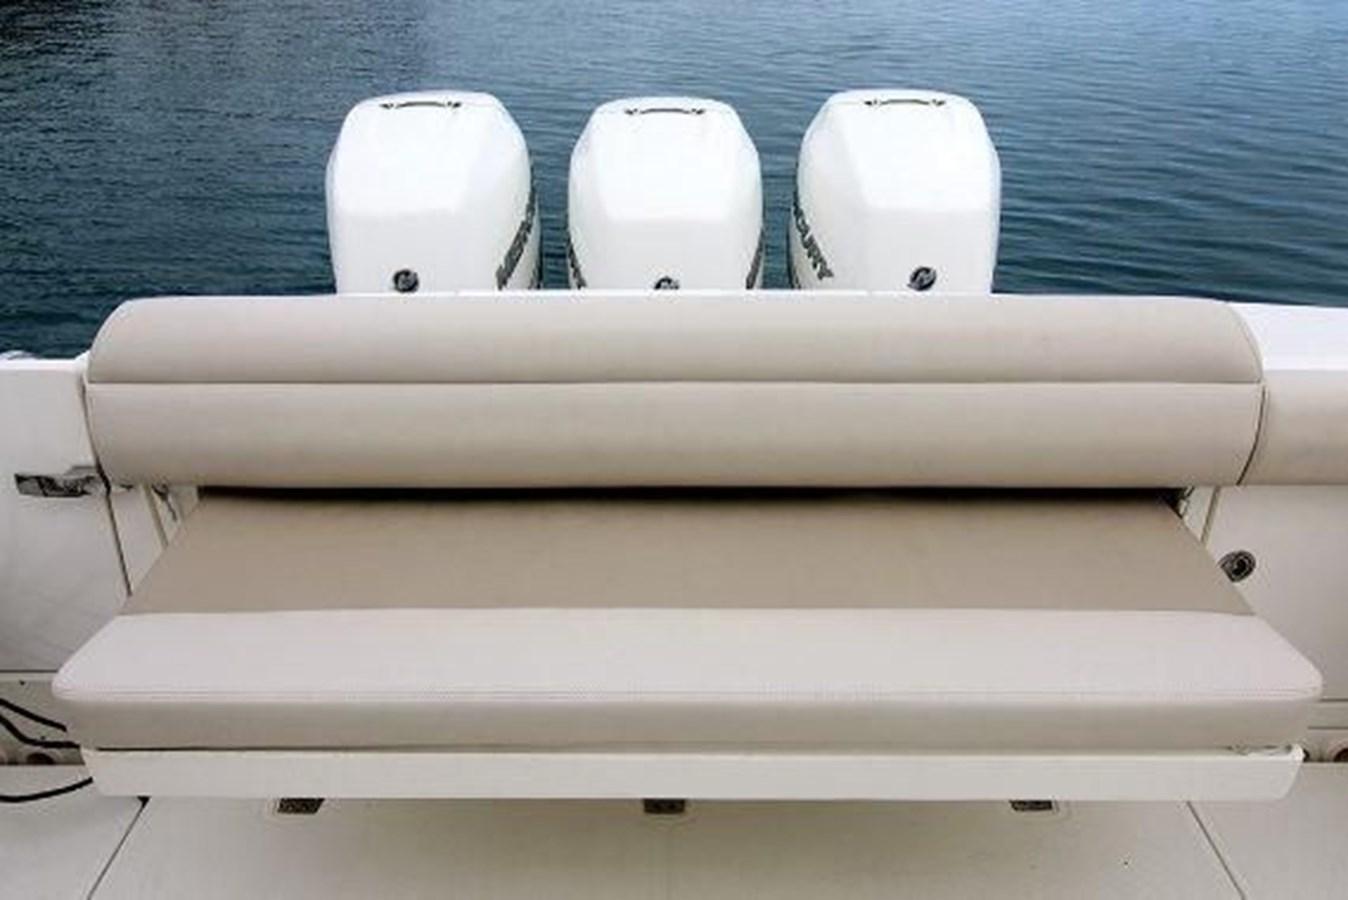 7372585_20200220095410641_1_XLARGE 2020 BOSTON WHALER  Deck Boat 2856393